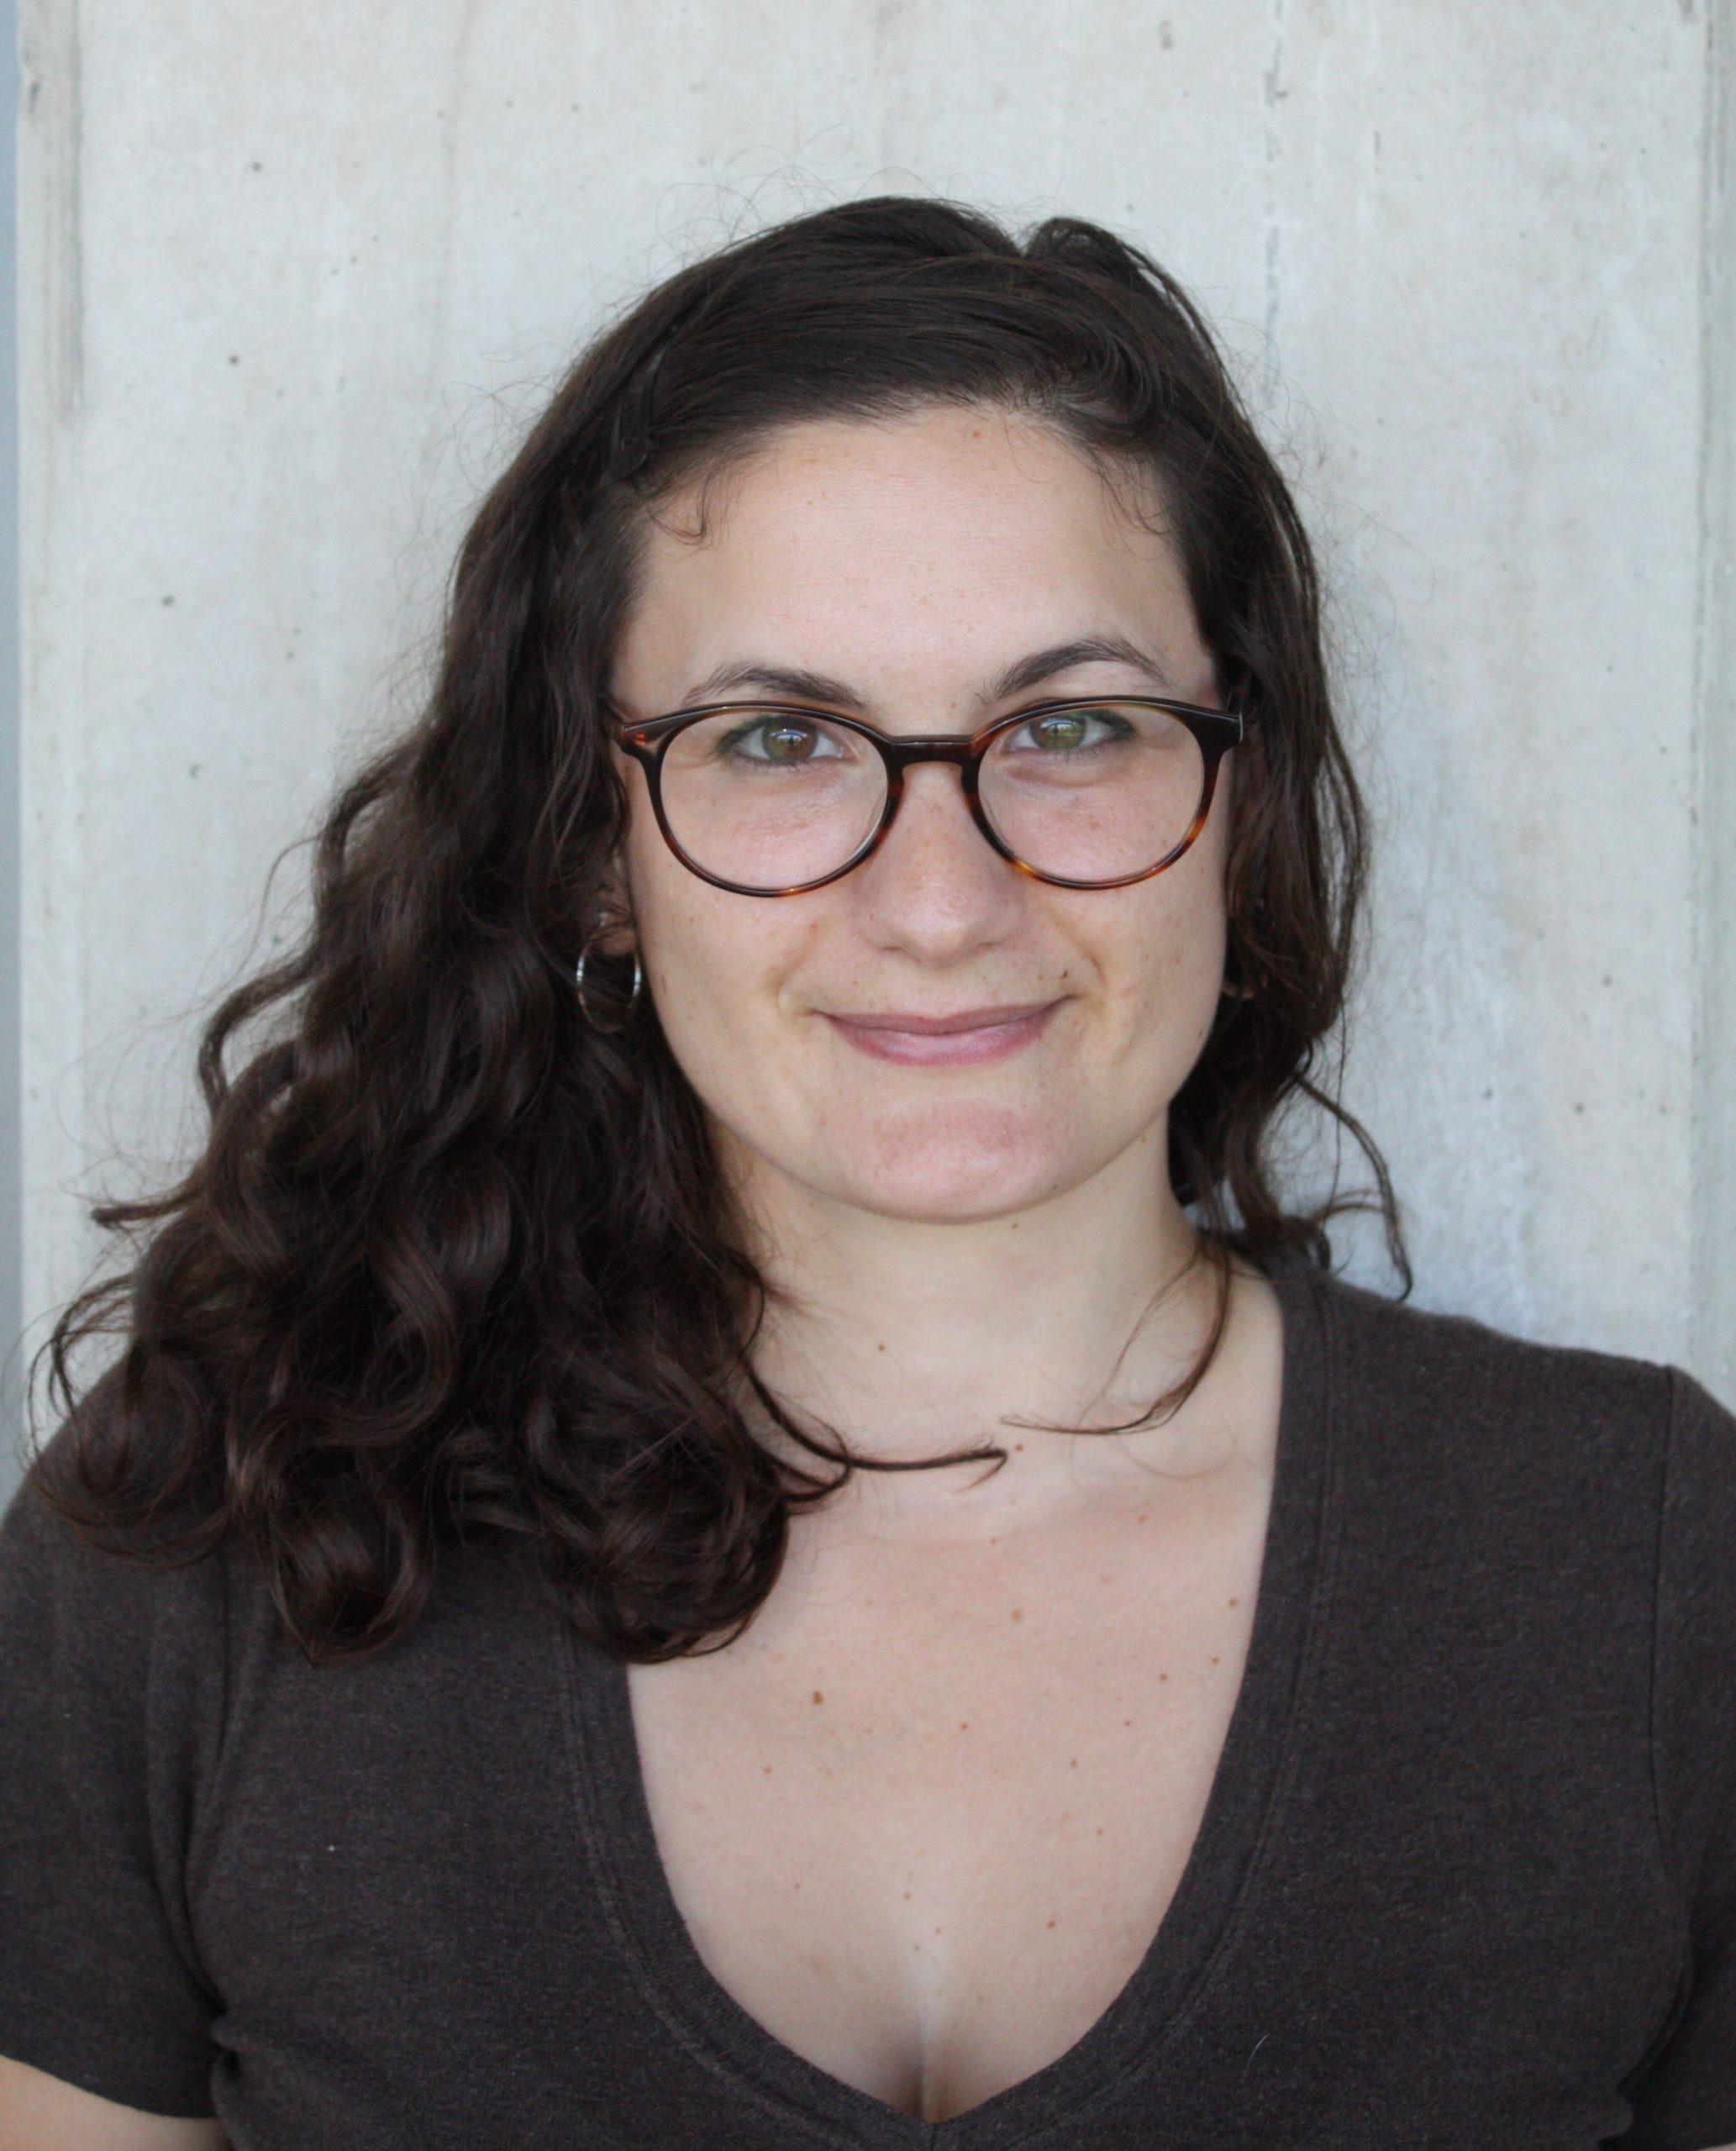 Morgan DeSantis : Primary Investigator